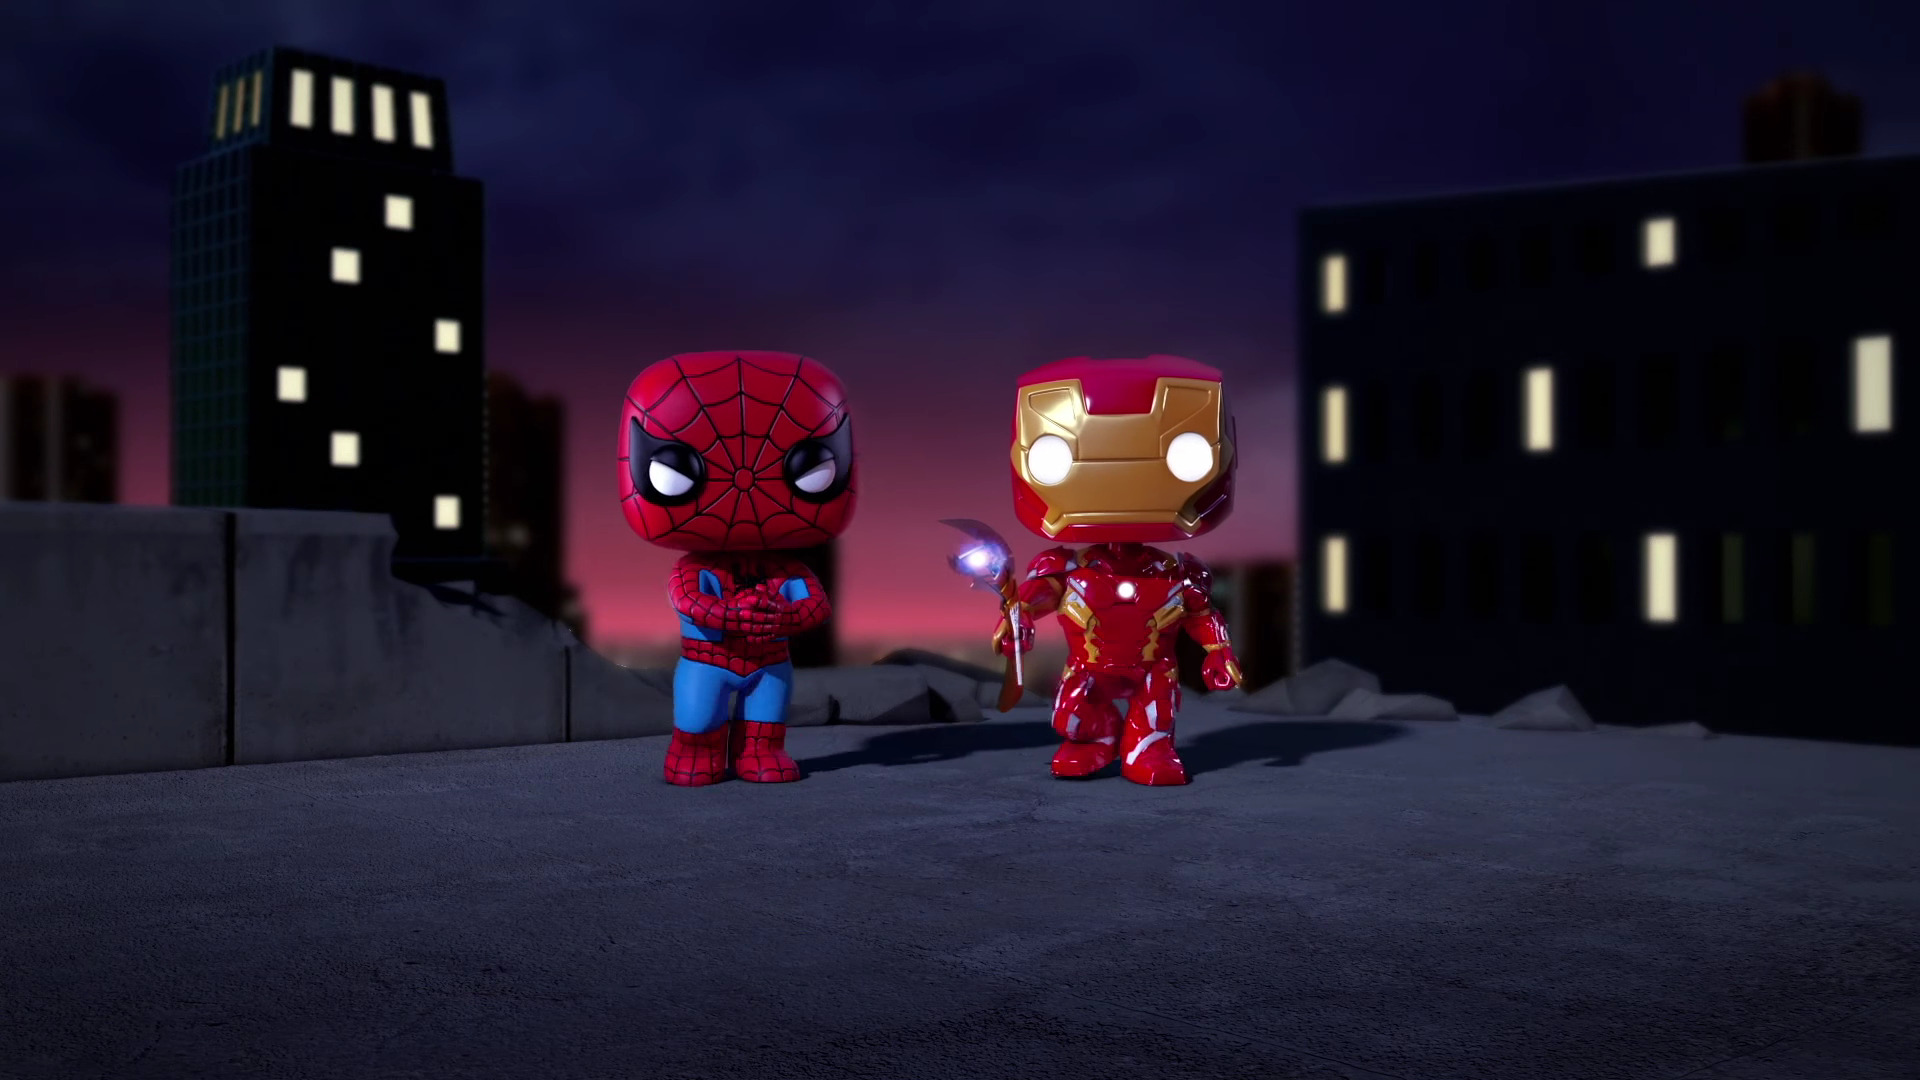 download 1920x1080 wallpaper iron man and spiderman spellbound